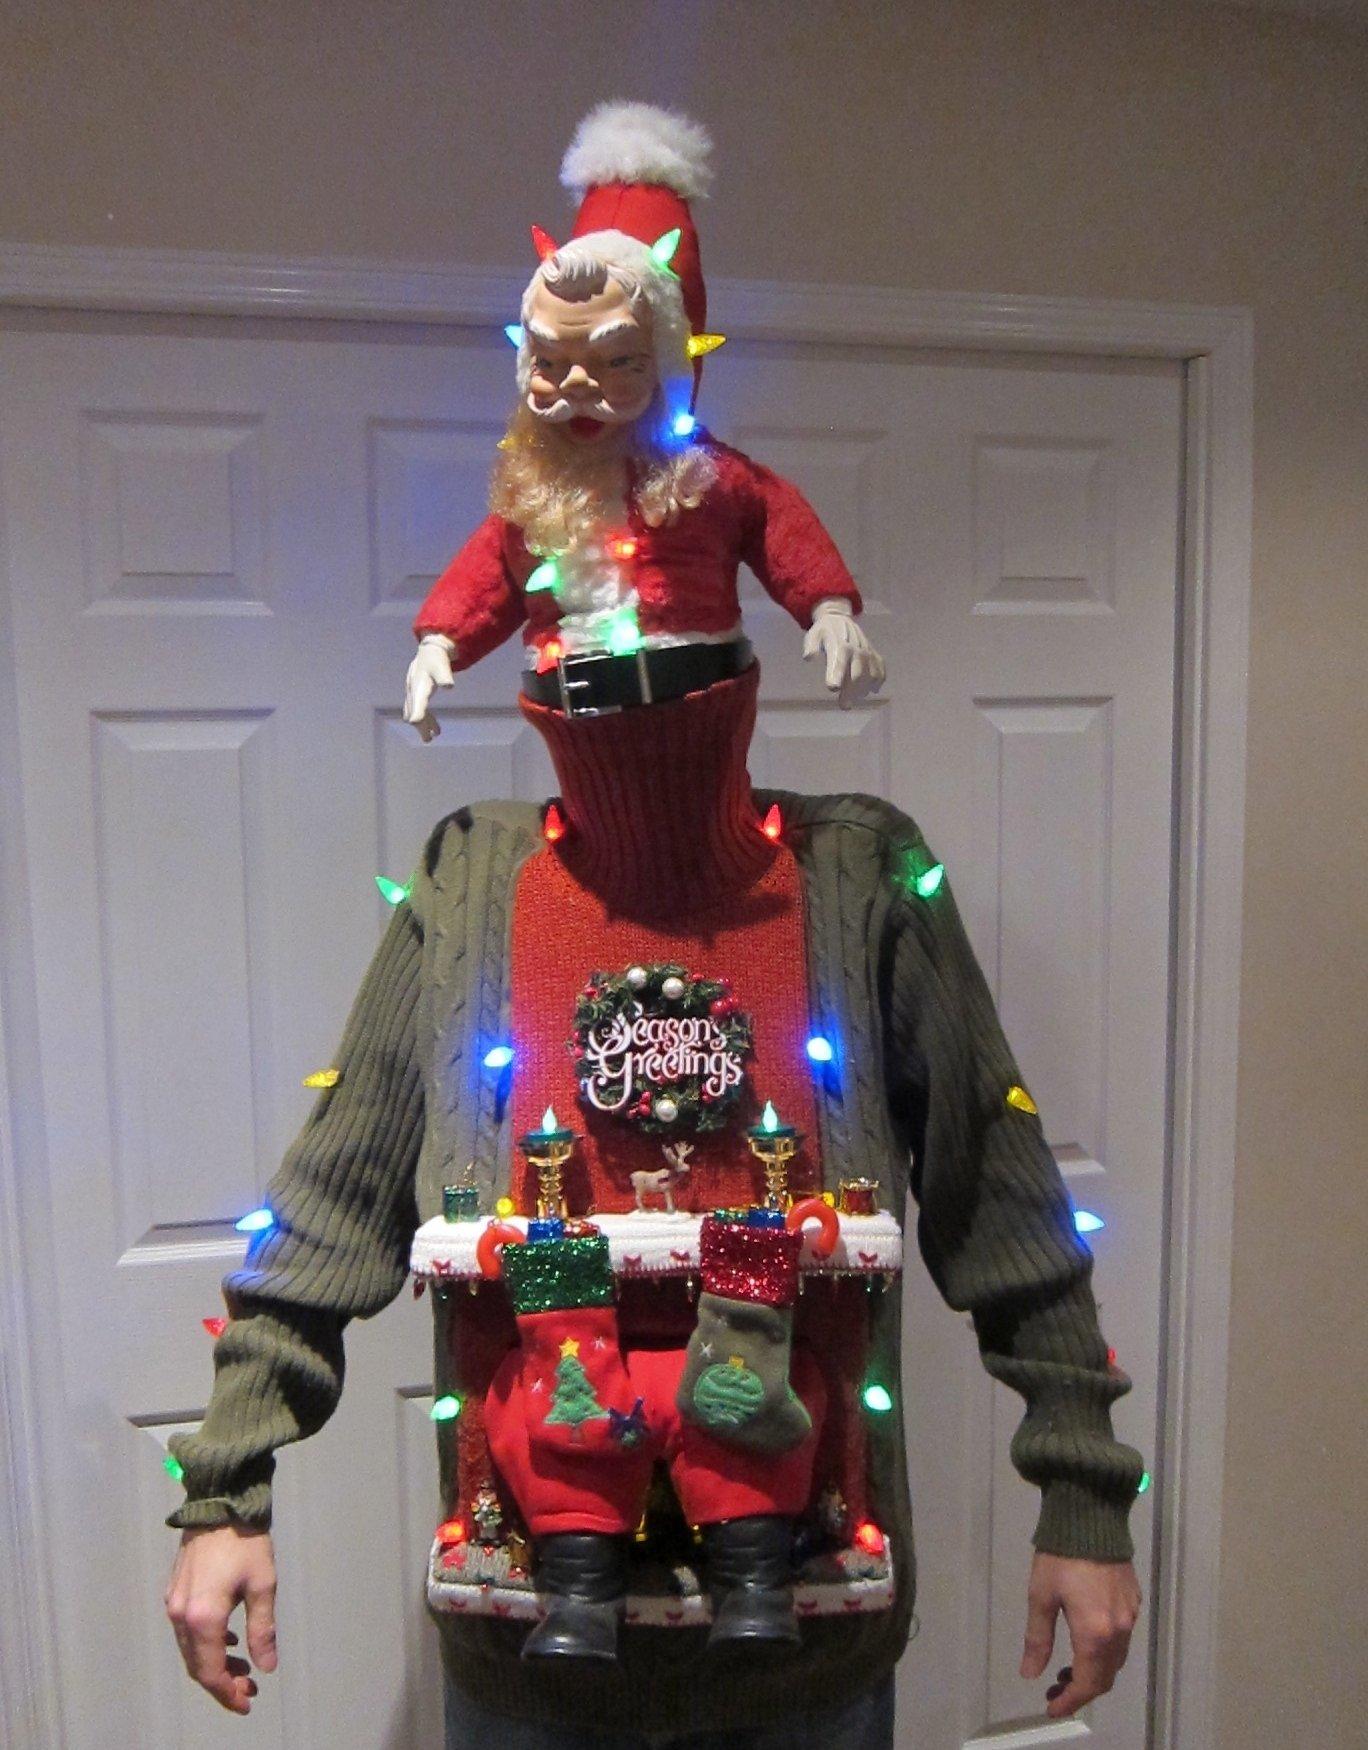 10 Stylish Ugly Christmas Sweaters Ideas Homemade 53 diy ugly christmas sweater ideas 3 2021